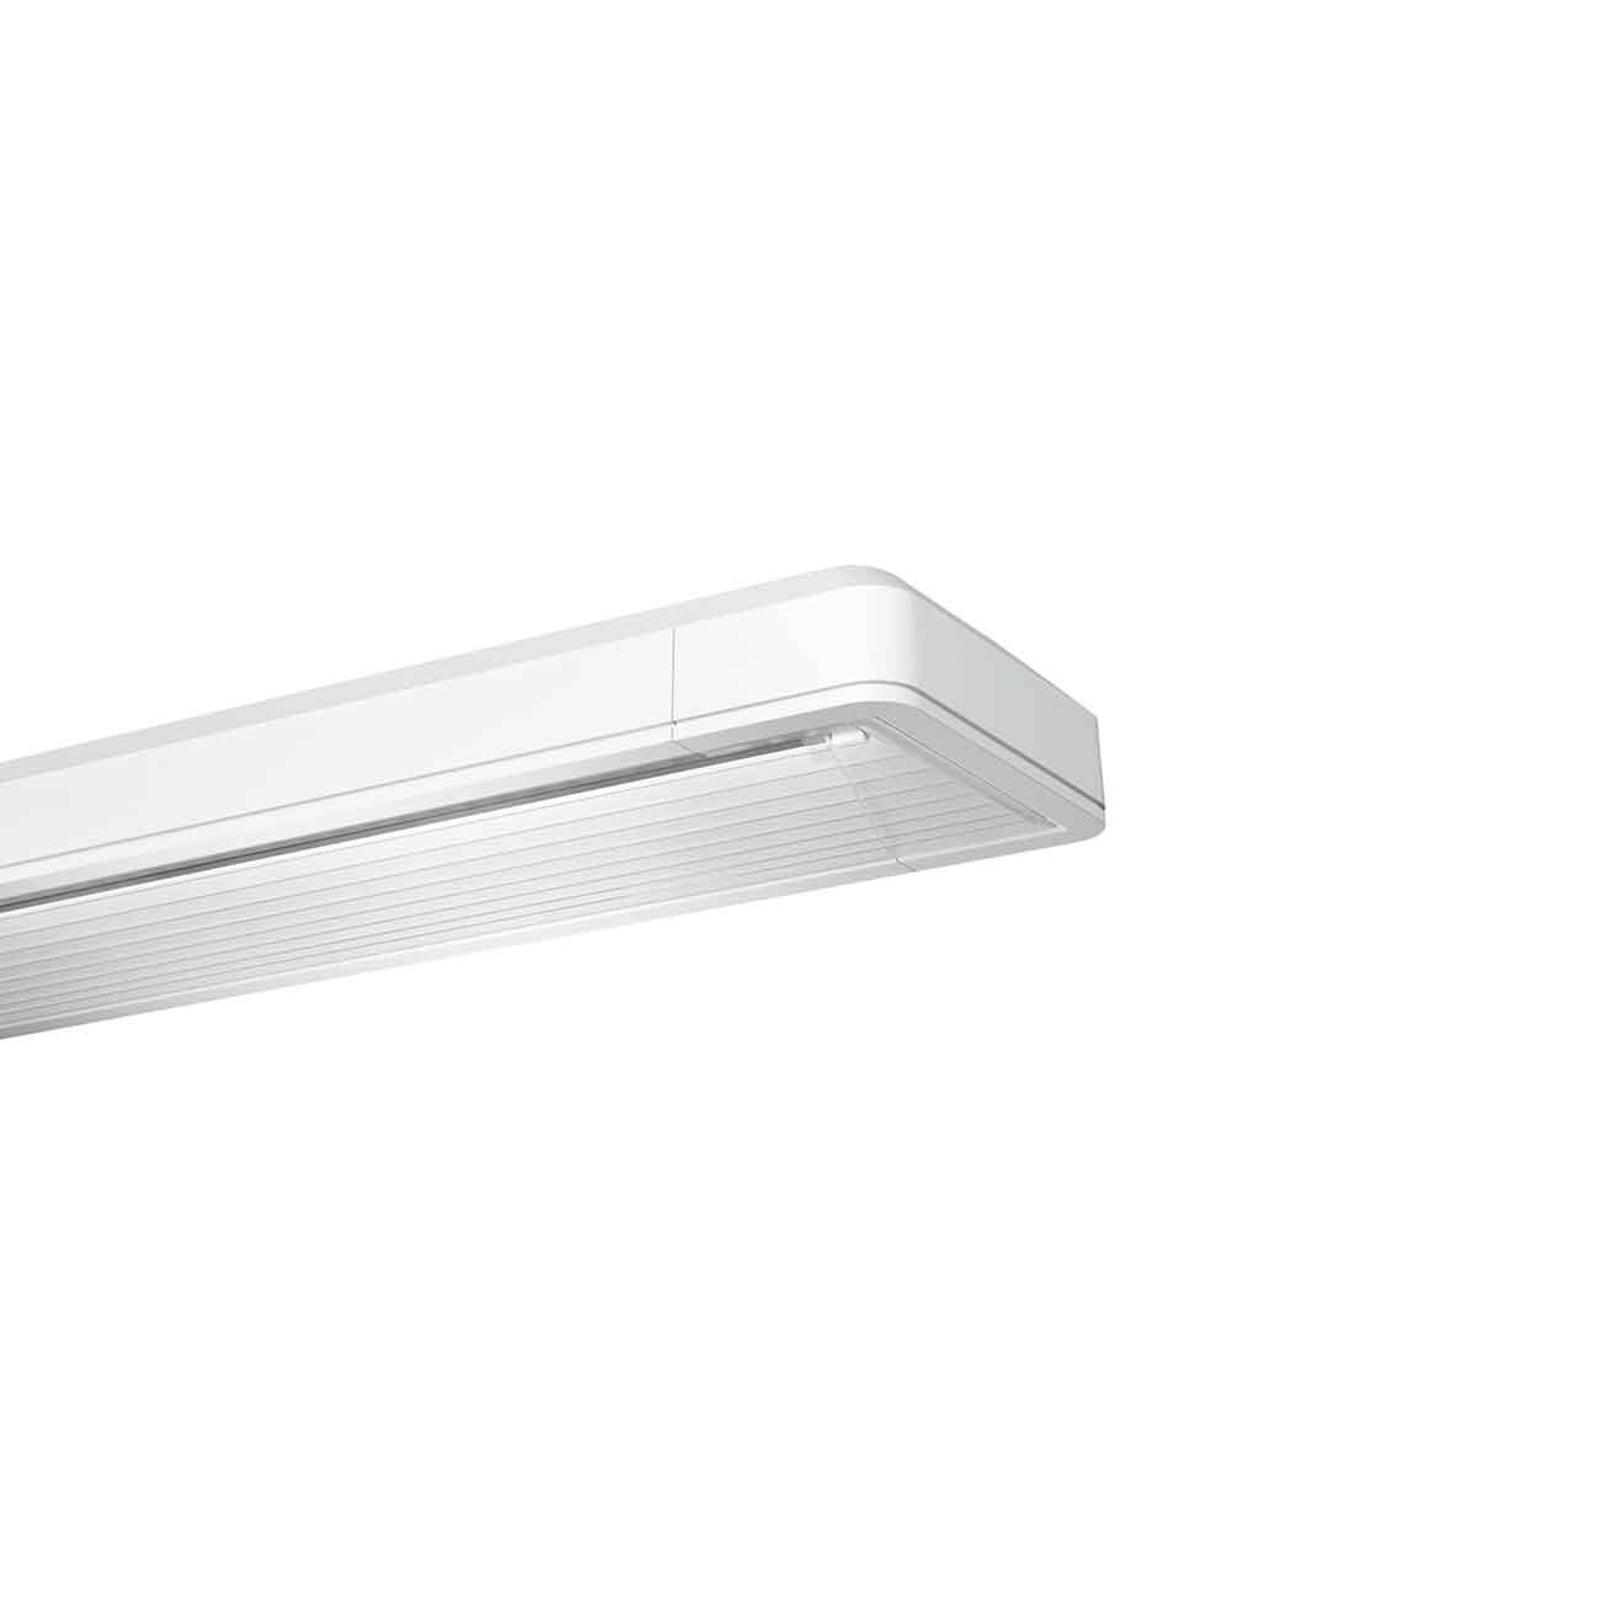 Siteco Taris lampa sufitowa LED 123cm EVG-DALI